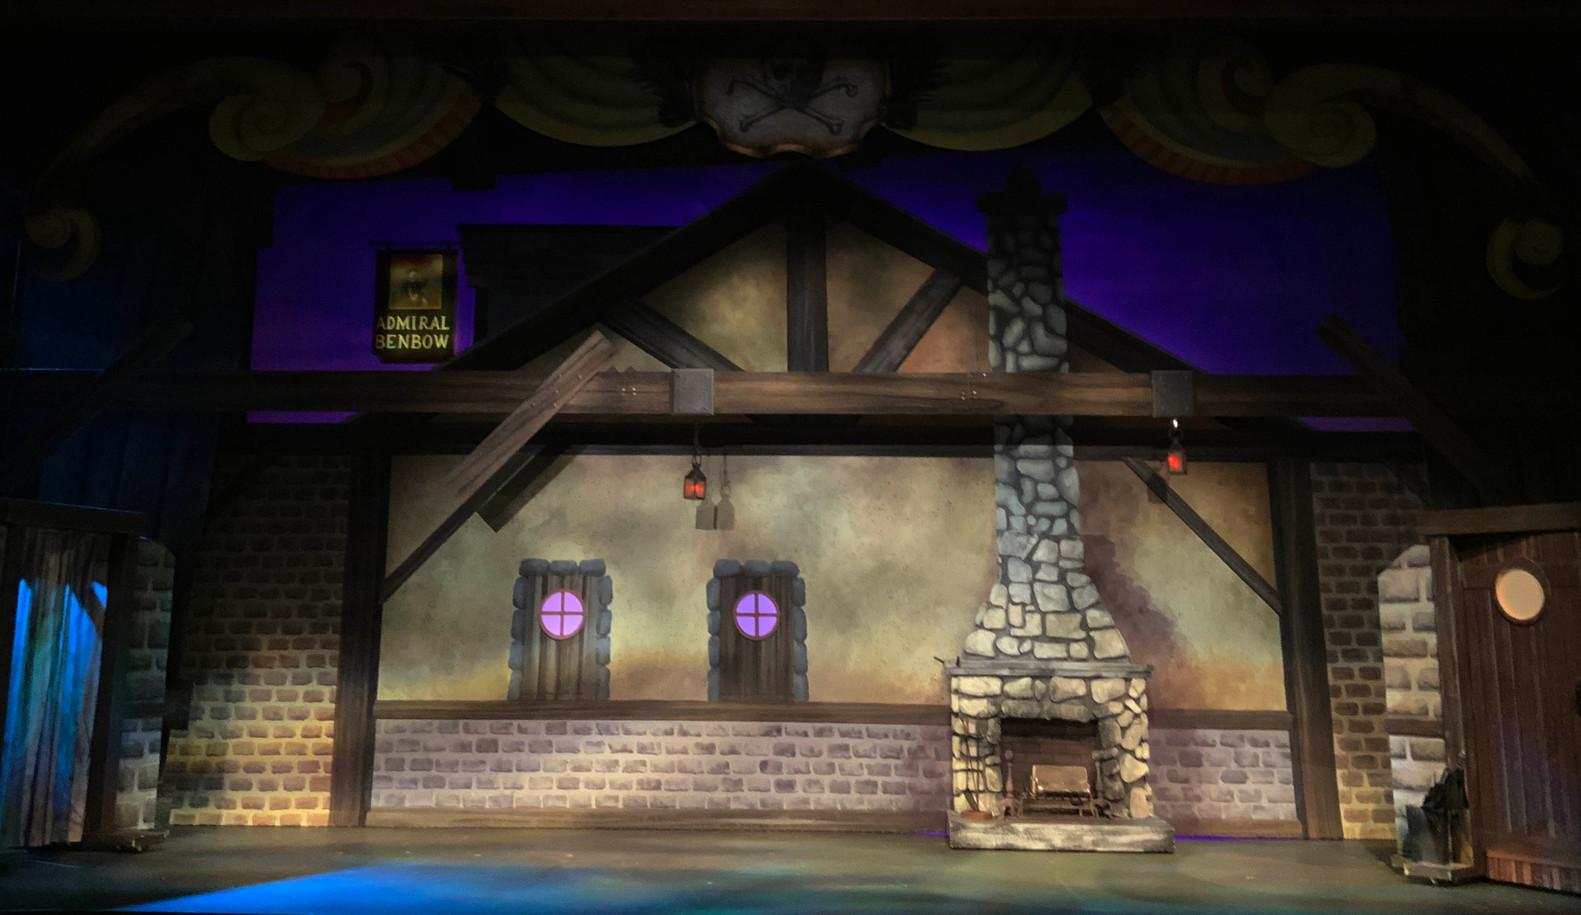 Treasure Island, Benbow Inn Transluceny